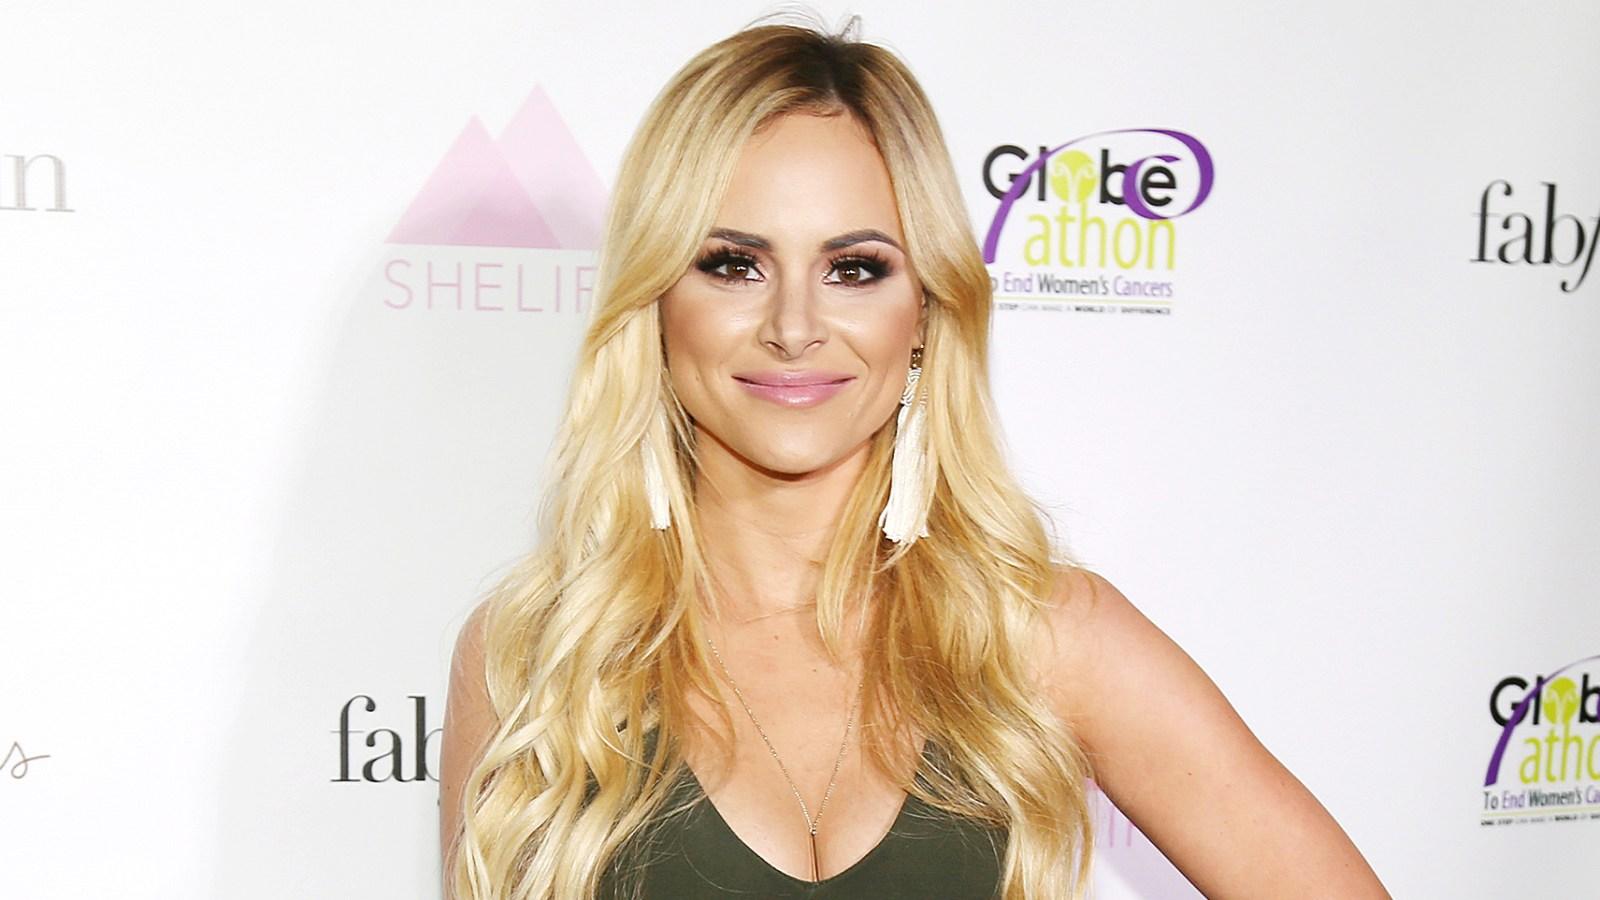 The Bachelor's Amanda Stanton Reveals She Had Breast Augmentation Surgery